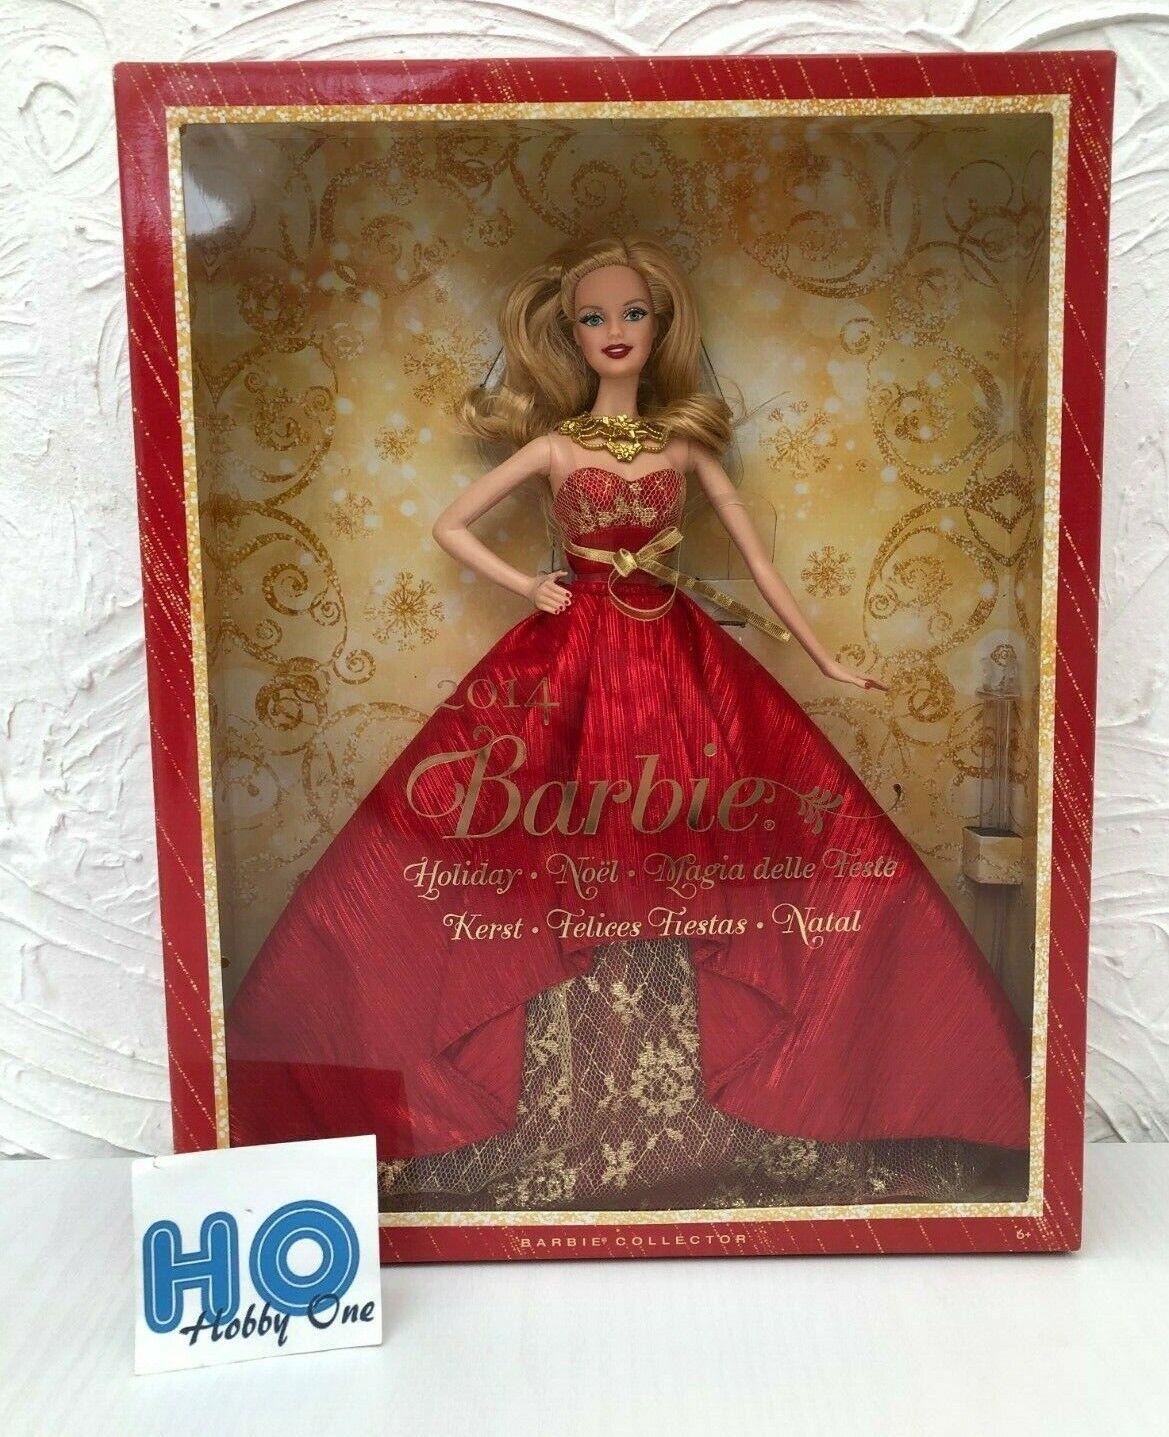 Bambola - Mattel - Barbie collezionista - Holliday    Noël - 2014 - BDH13 - NEUVE  moda